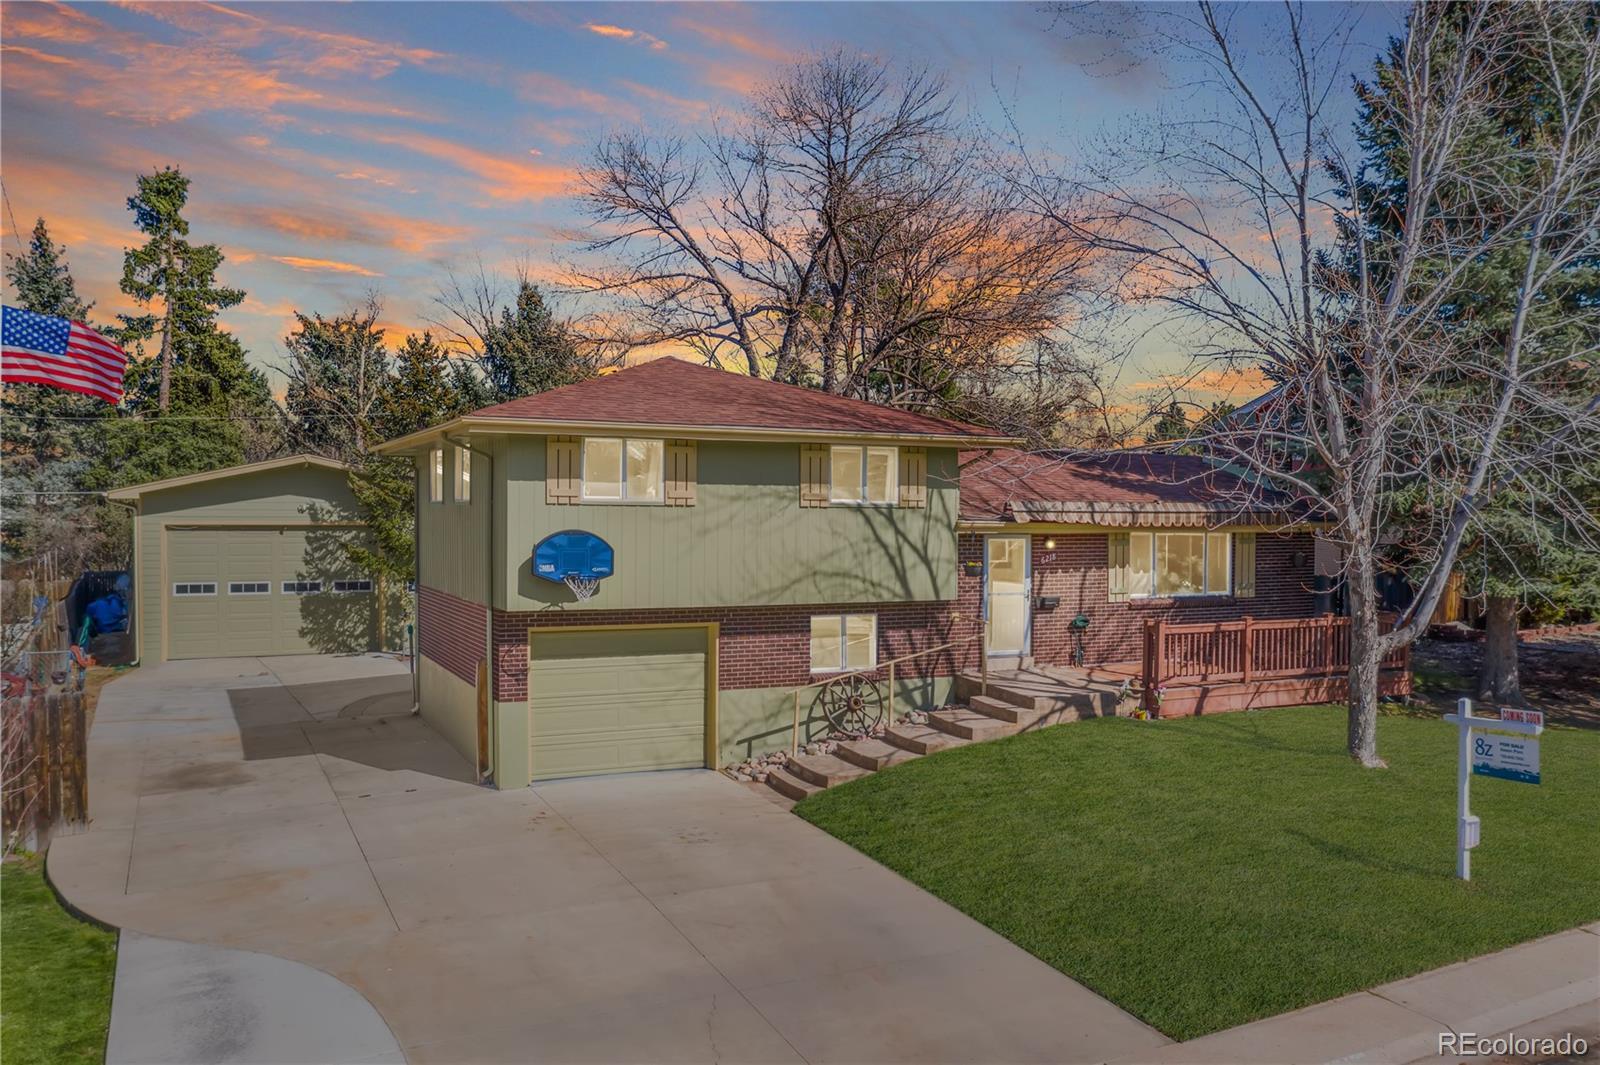 6218 S Madison Drive, Centennial, CO 80121 - Centennial, CO real estate listing